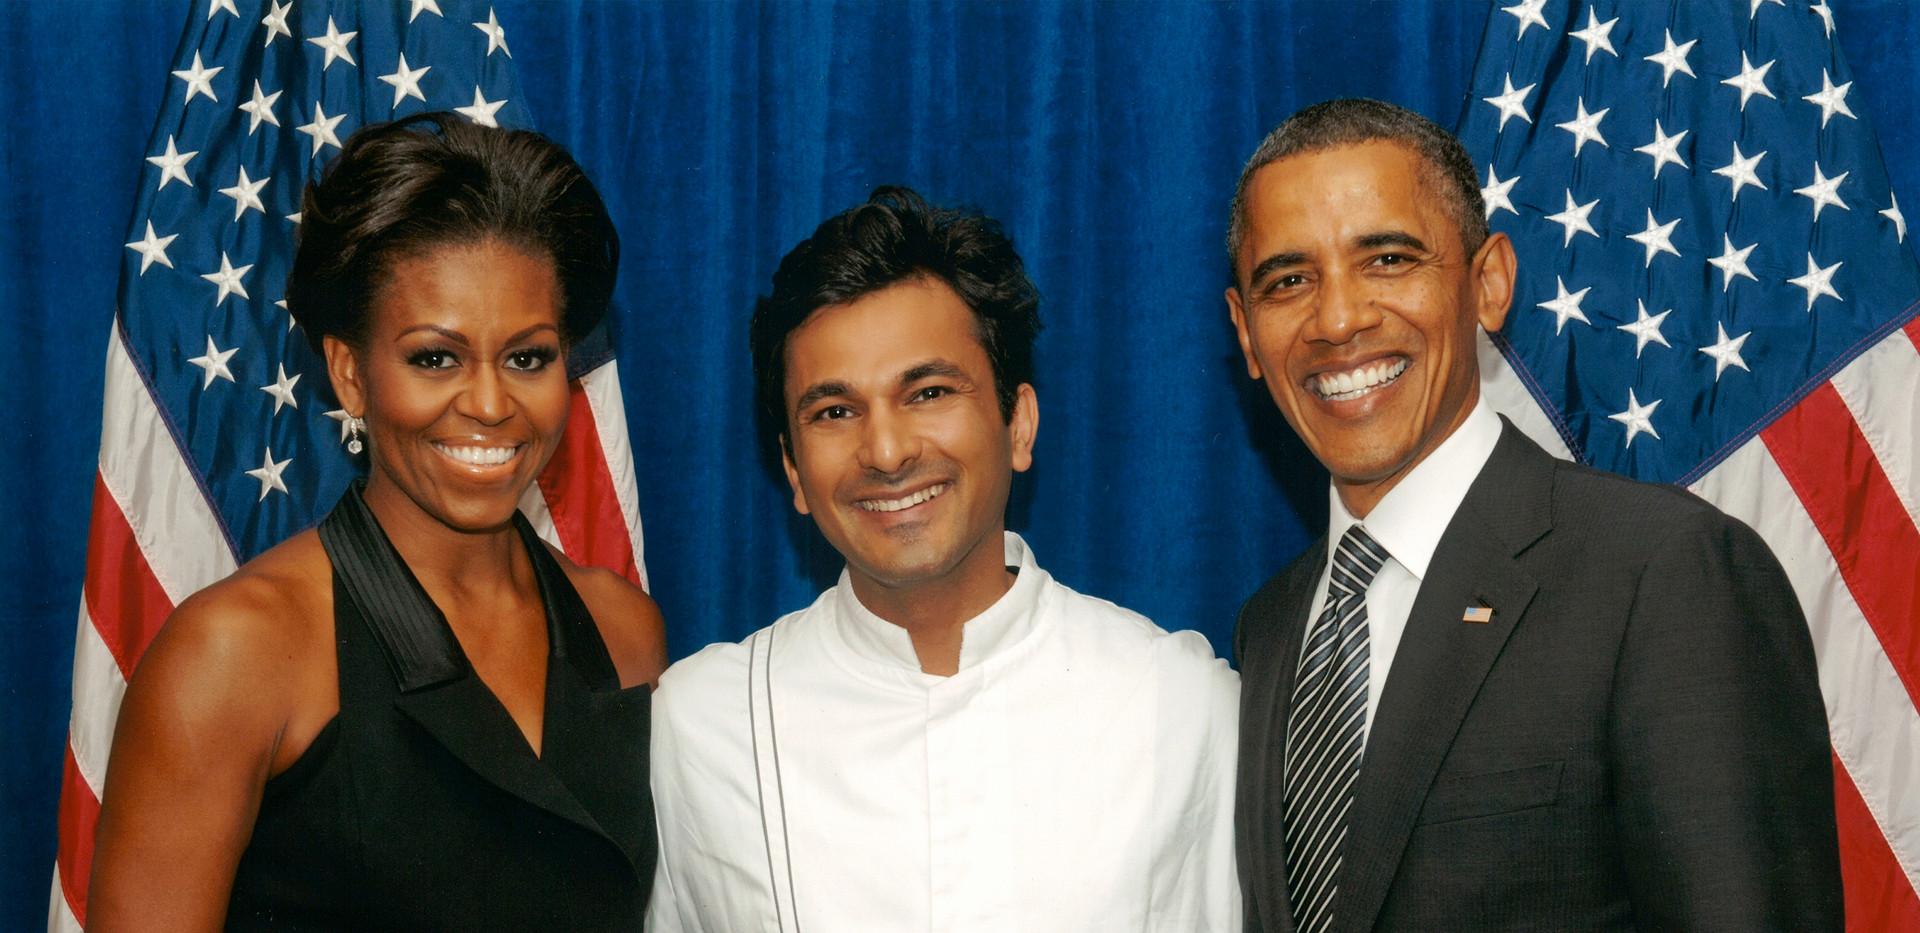 Vikas_President Obama and First Lady.jpg